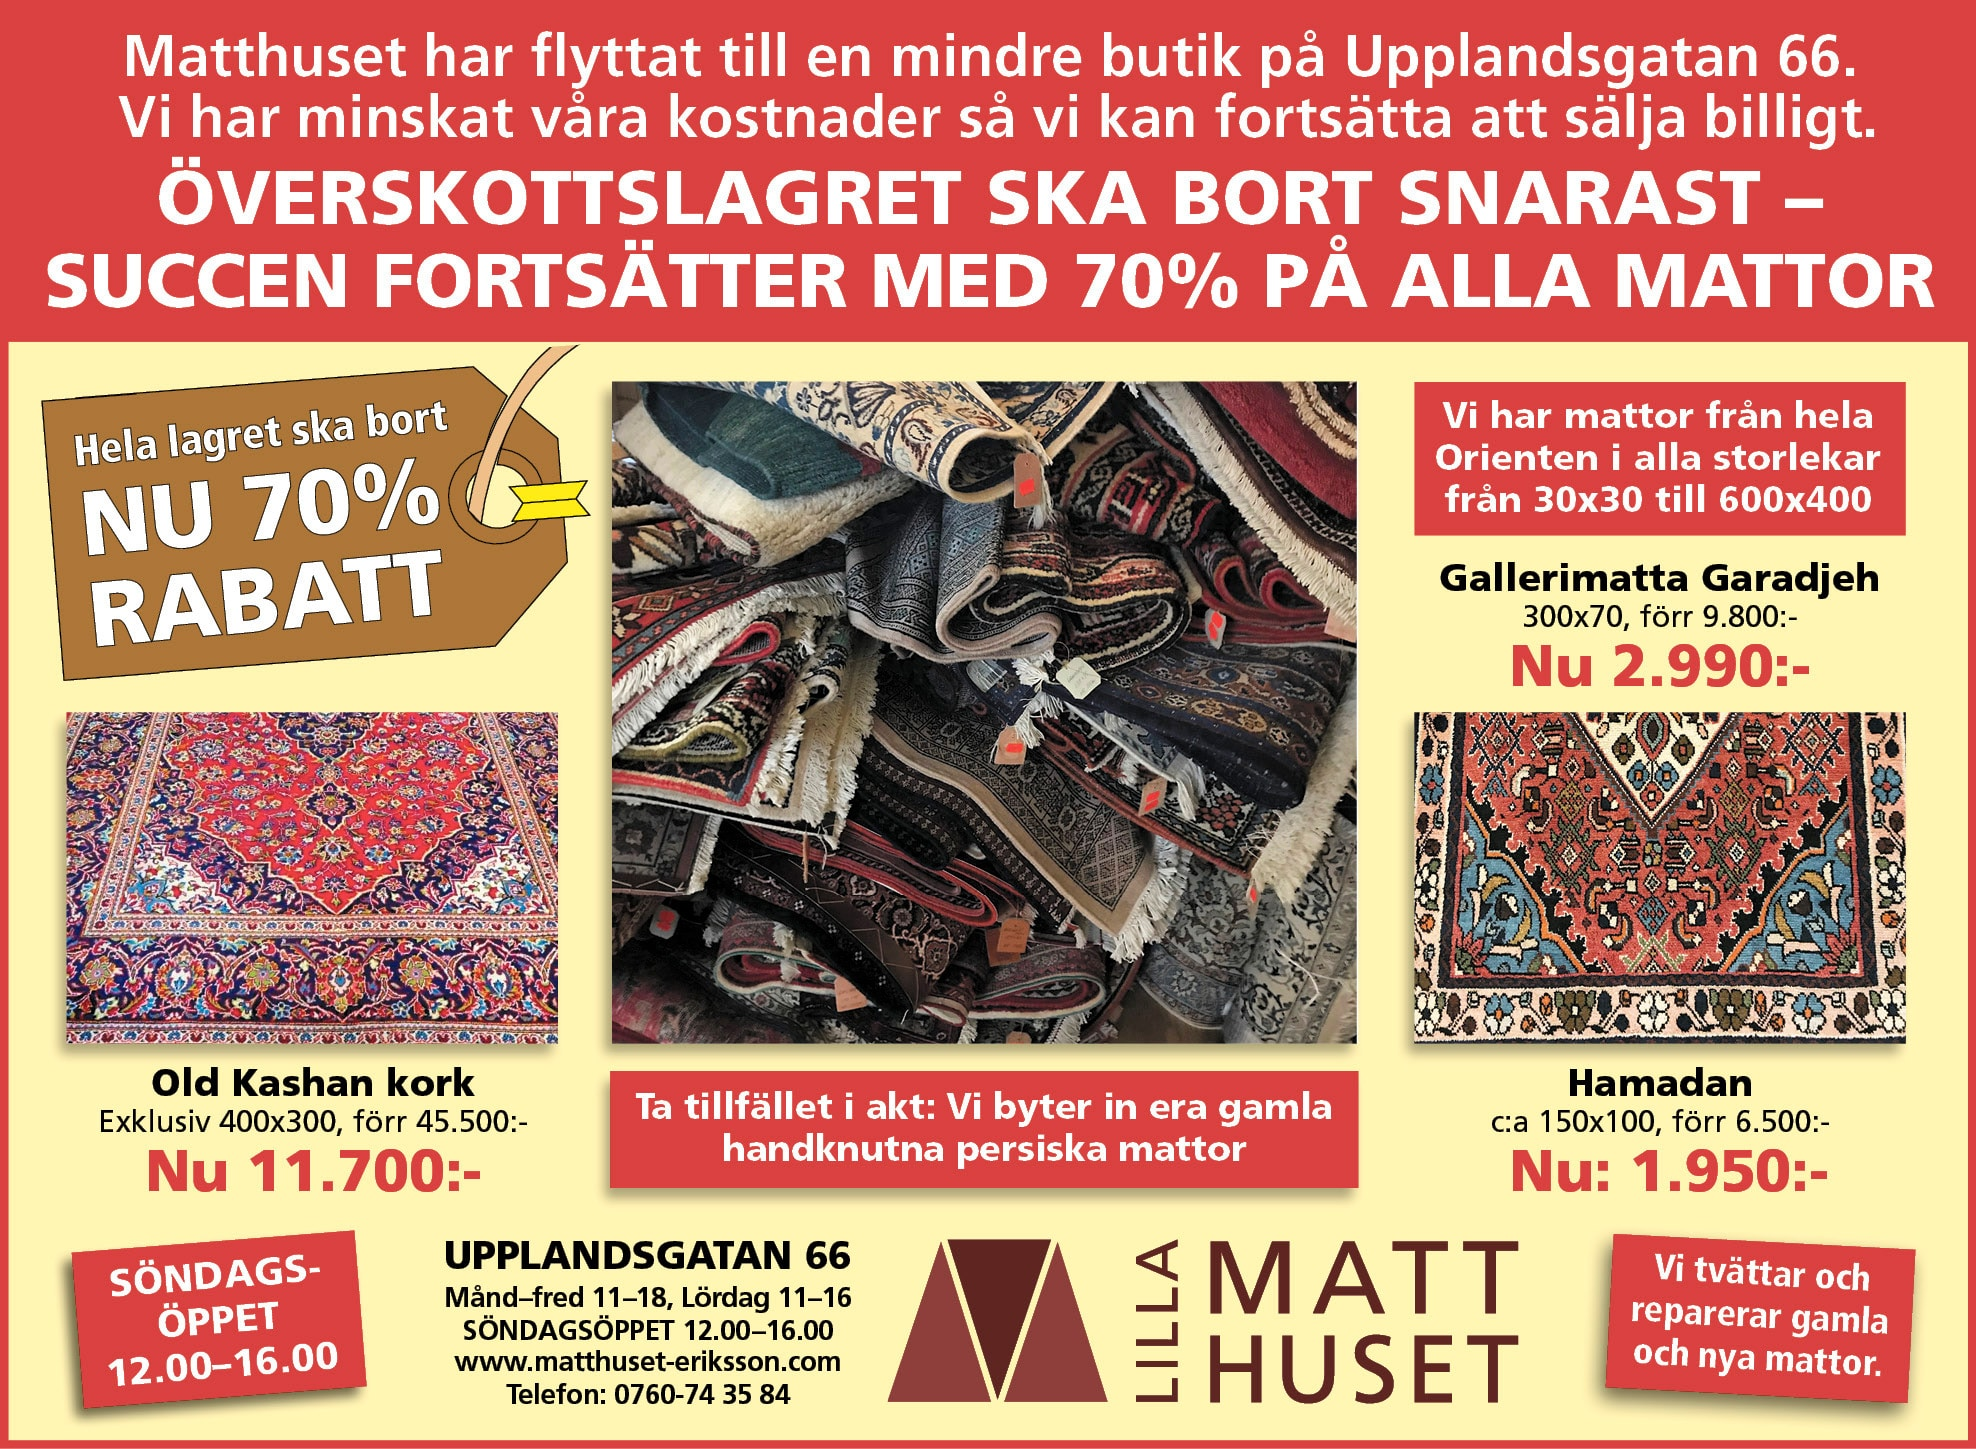 lilla-matthuset-svd-ny-0418-1976x1449px